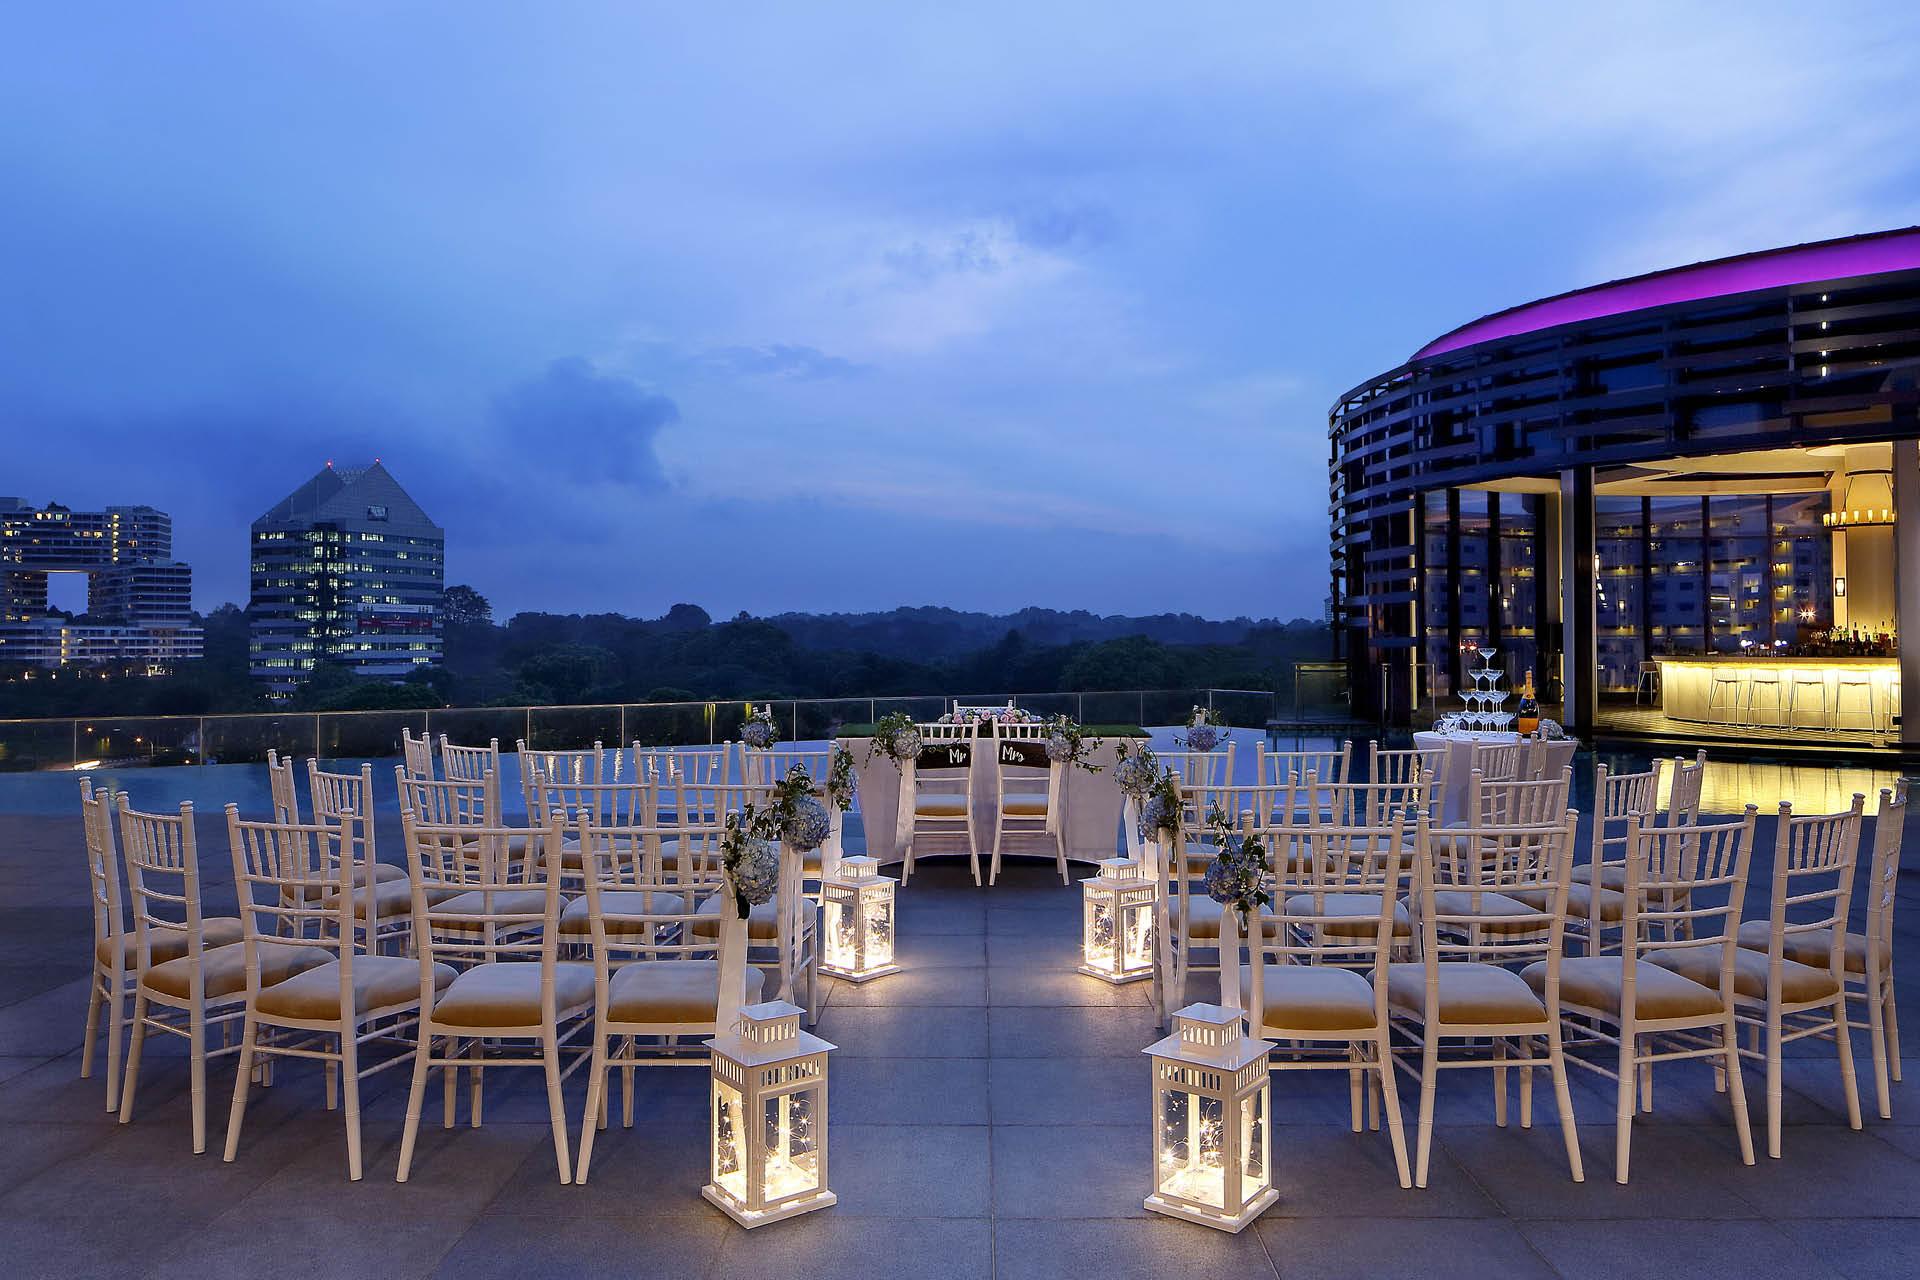 Image Credit - Park Hotel Alexandra